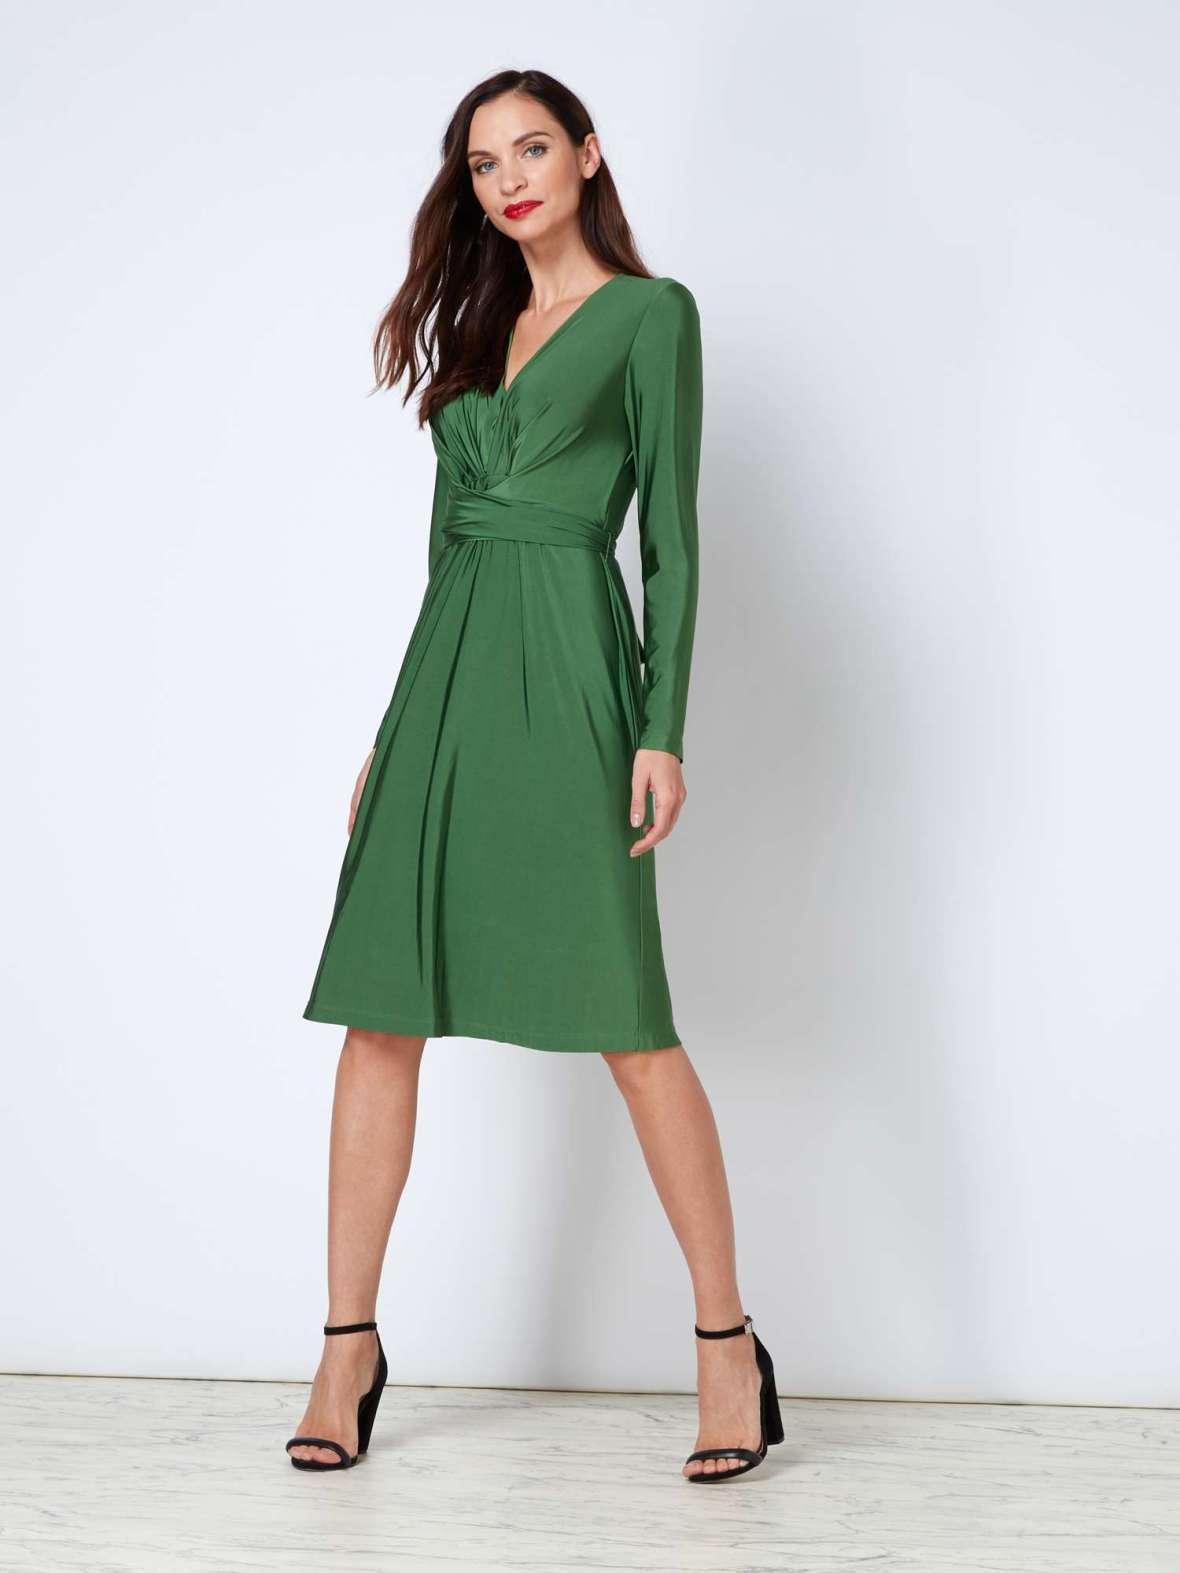 issa wrap dress r/r